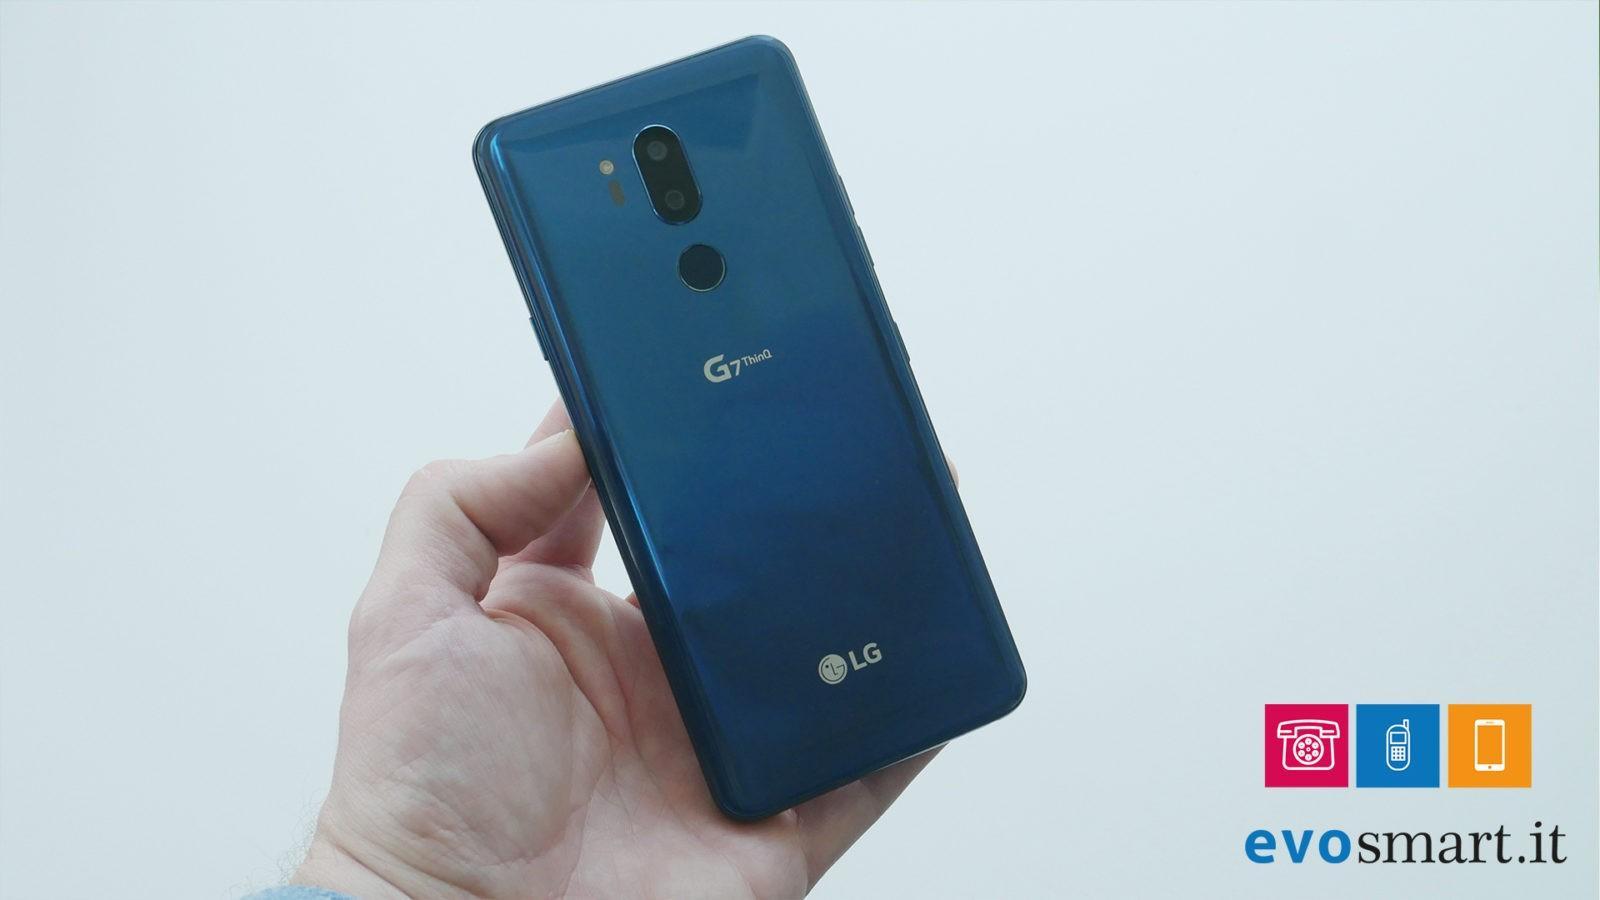 LG G7 doppia fotocamera